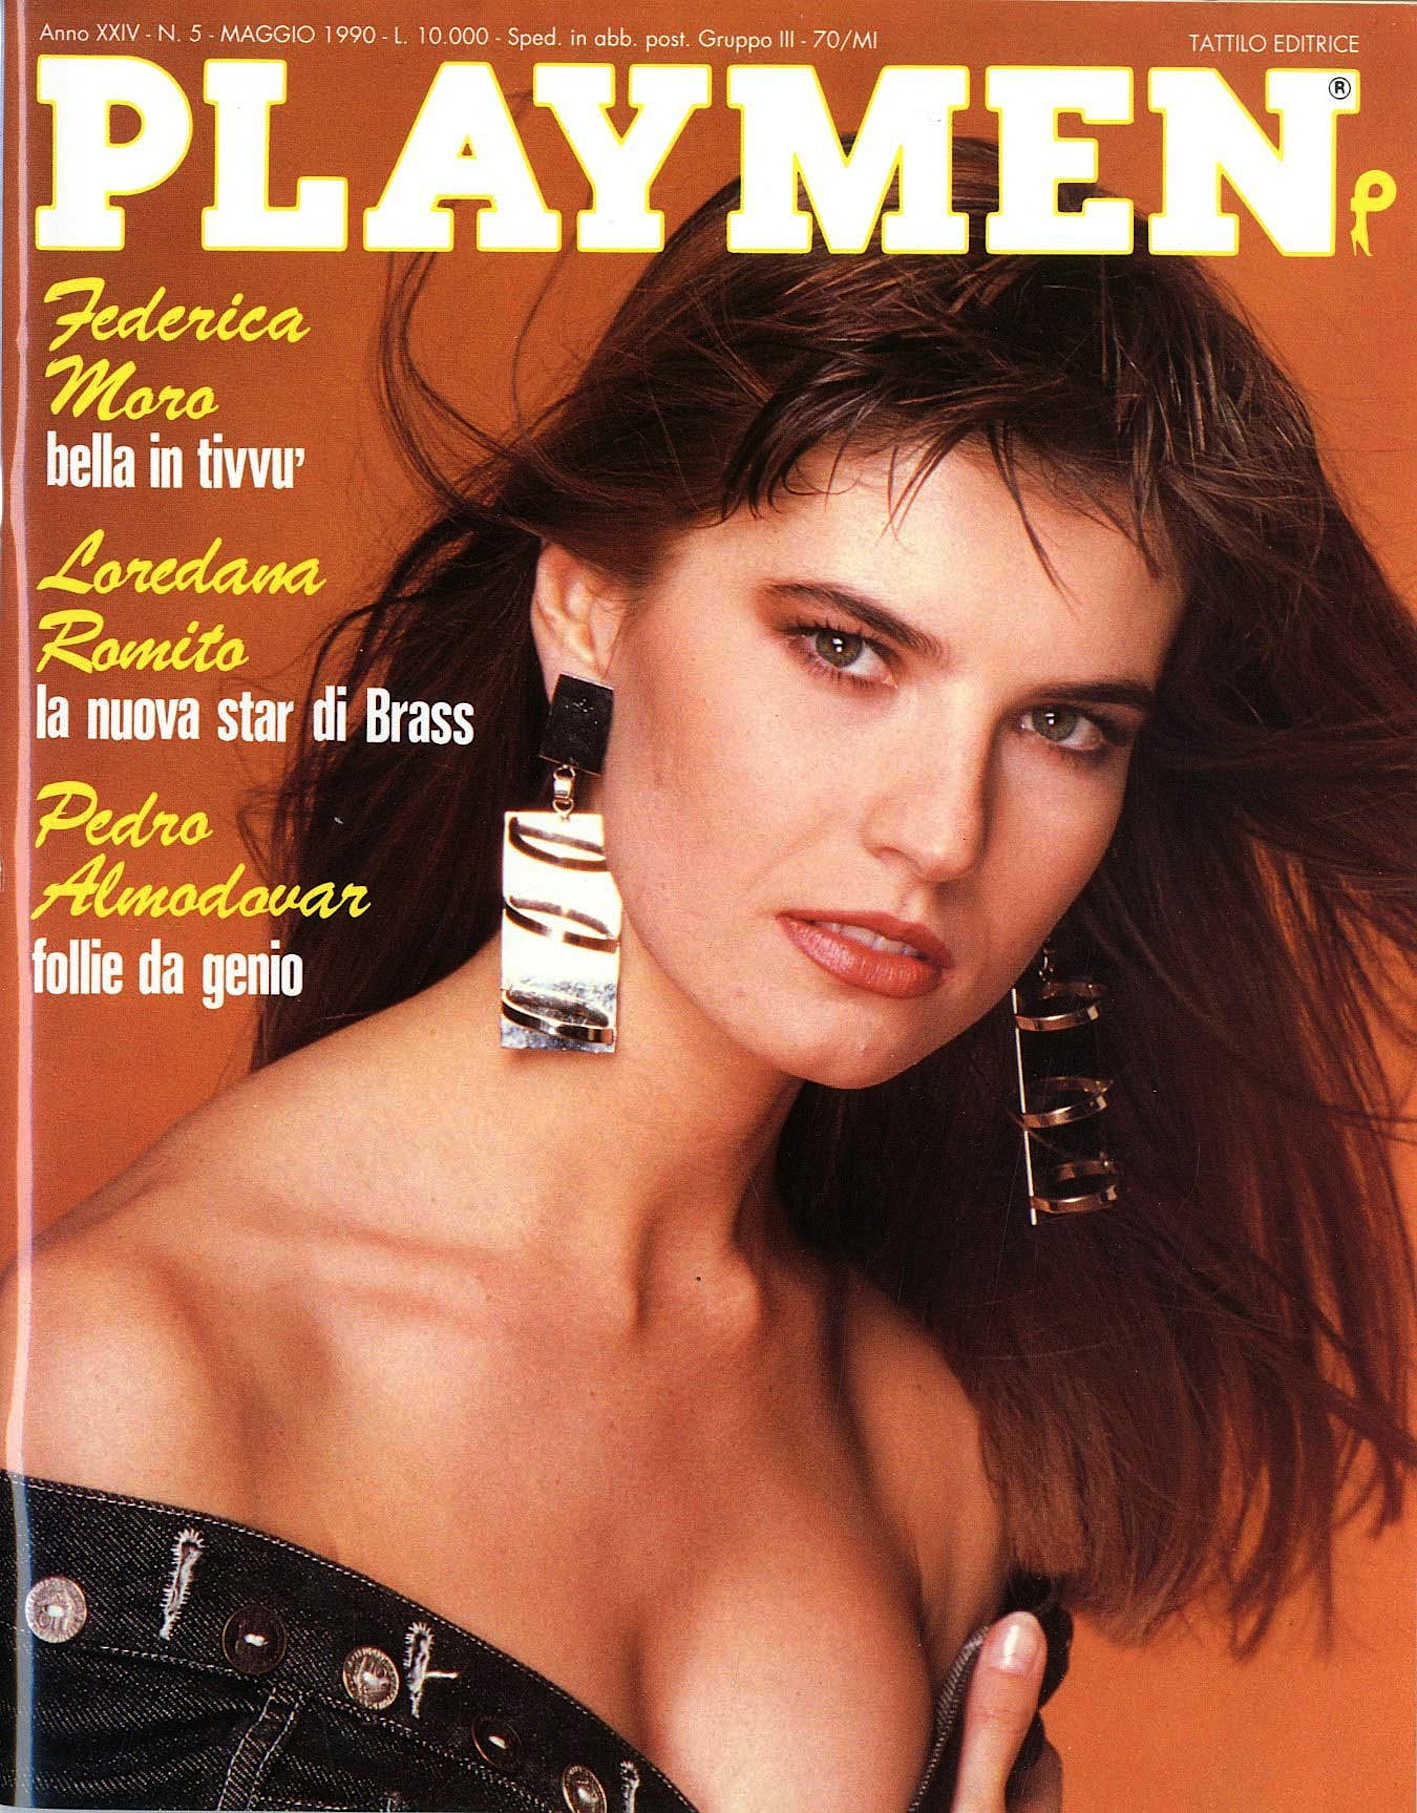 federica_moro_PLAYMEN-1990 copia